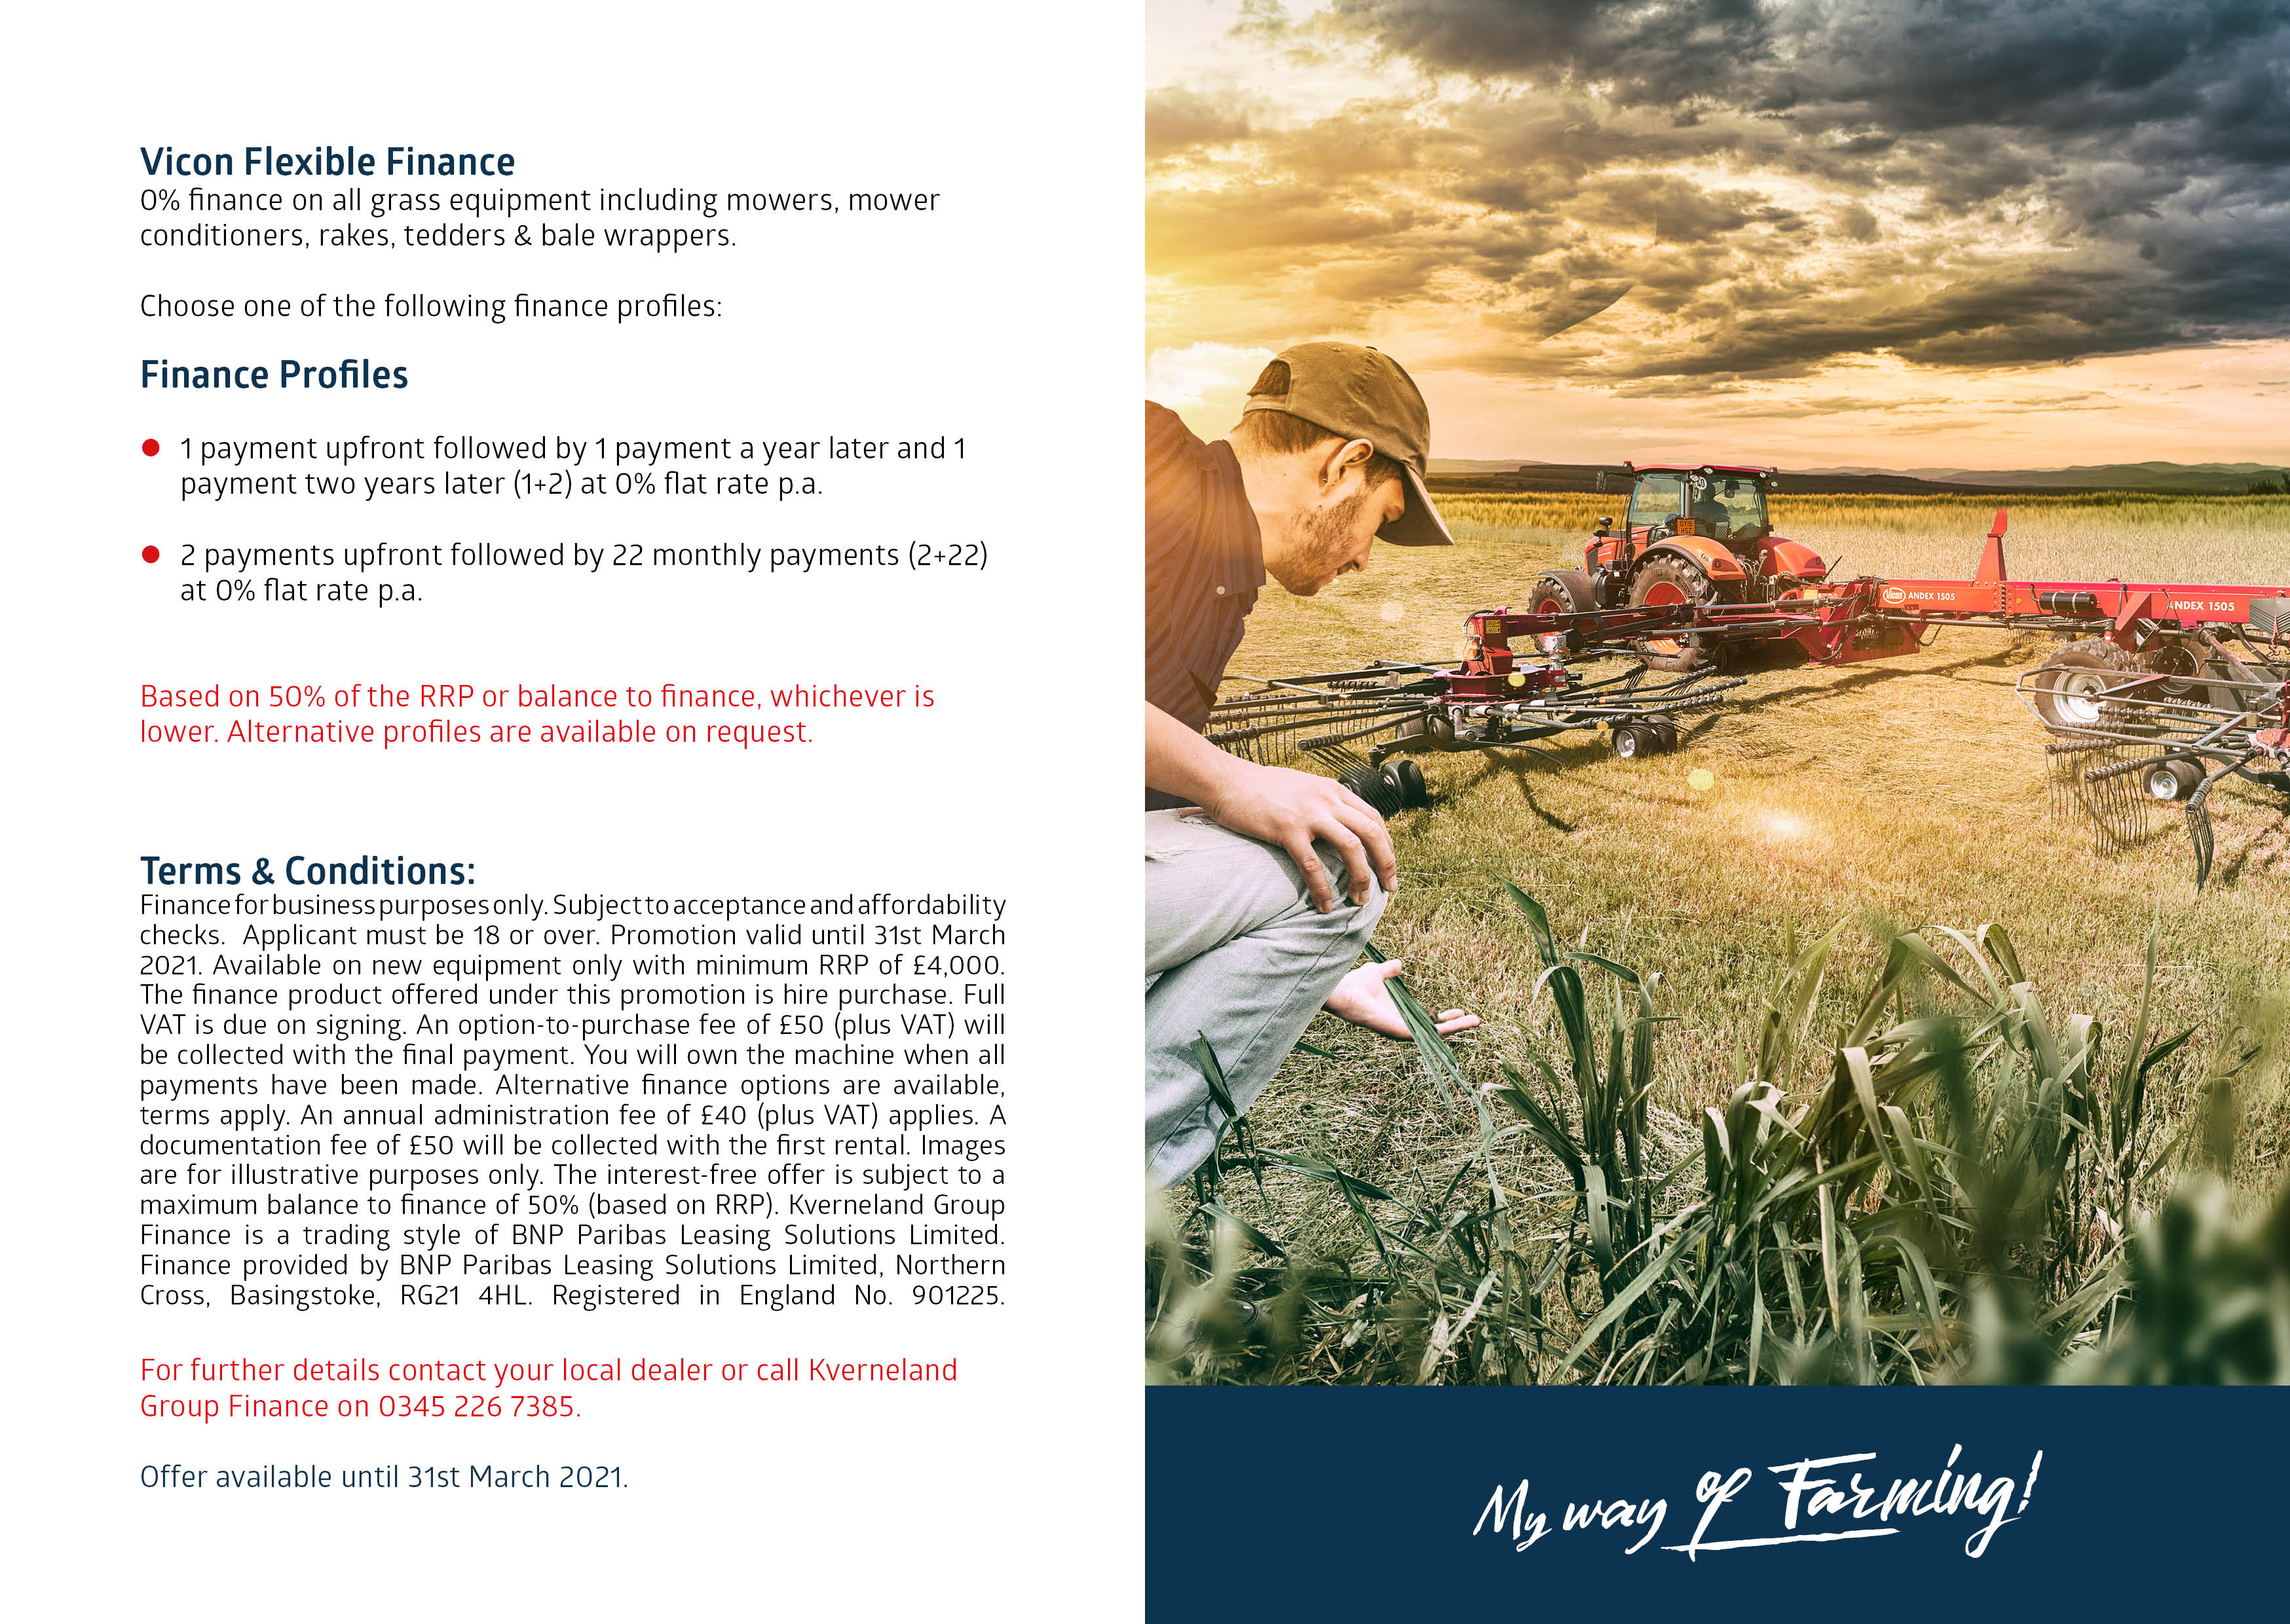 0% Vicon Grassland Machinery image